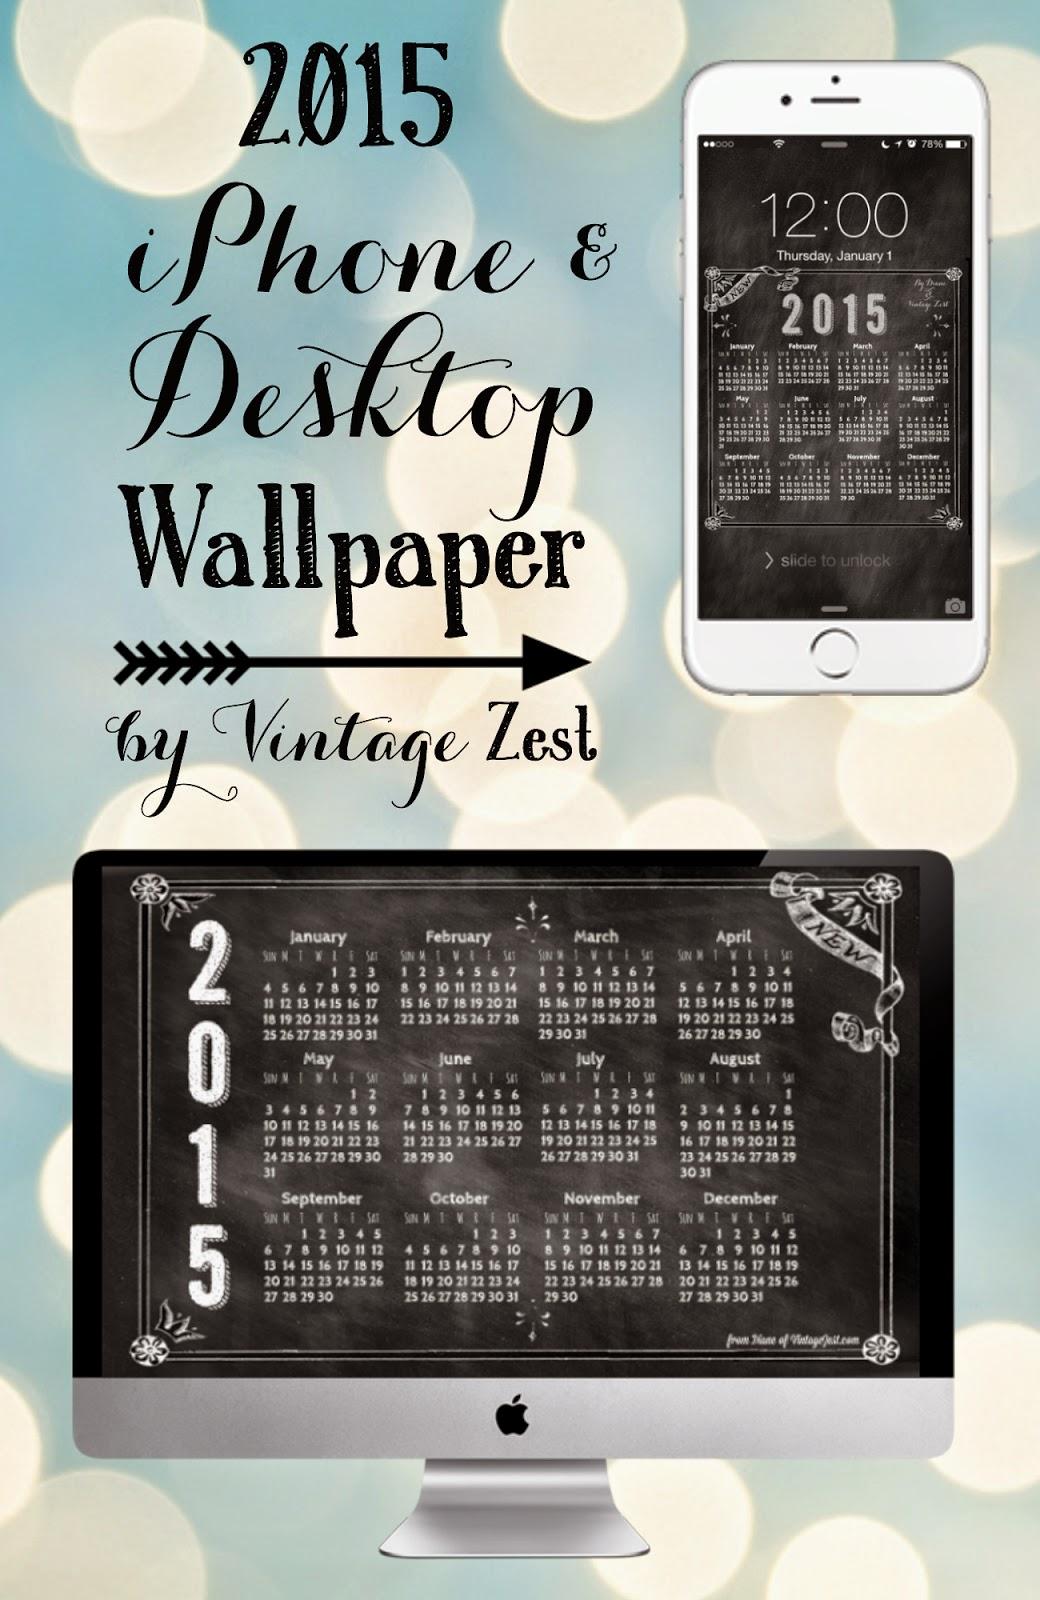 2015 iPhone & Desktop Wallpaper Freebies! on Diane's Vintage Zest!